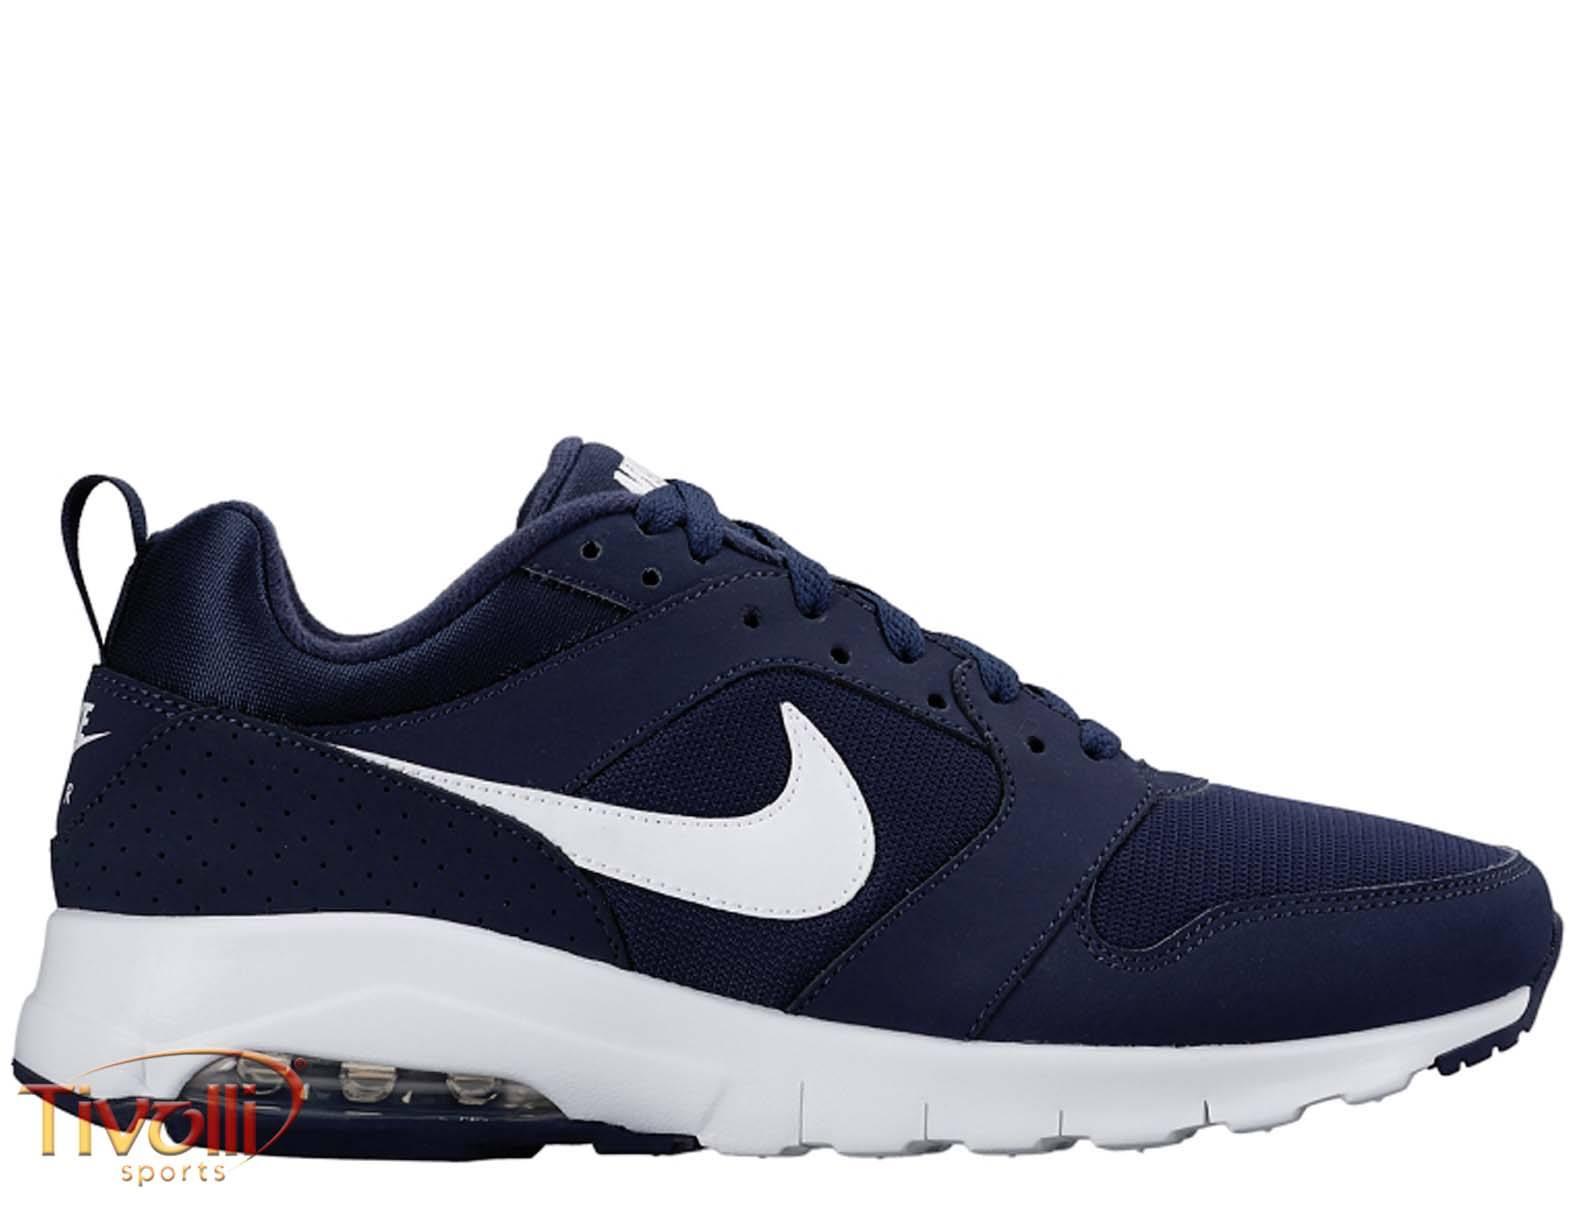 2a1b4946c9 Tênis Nike Air Max Motion Masculino   Azul Marinho e Branco